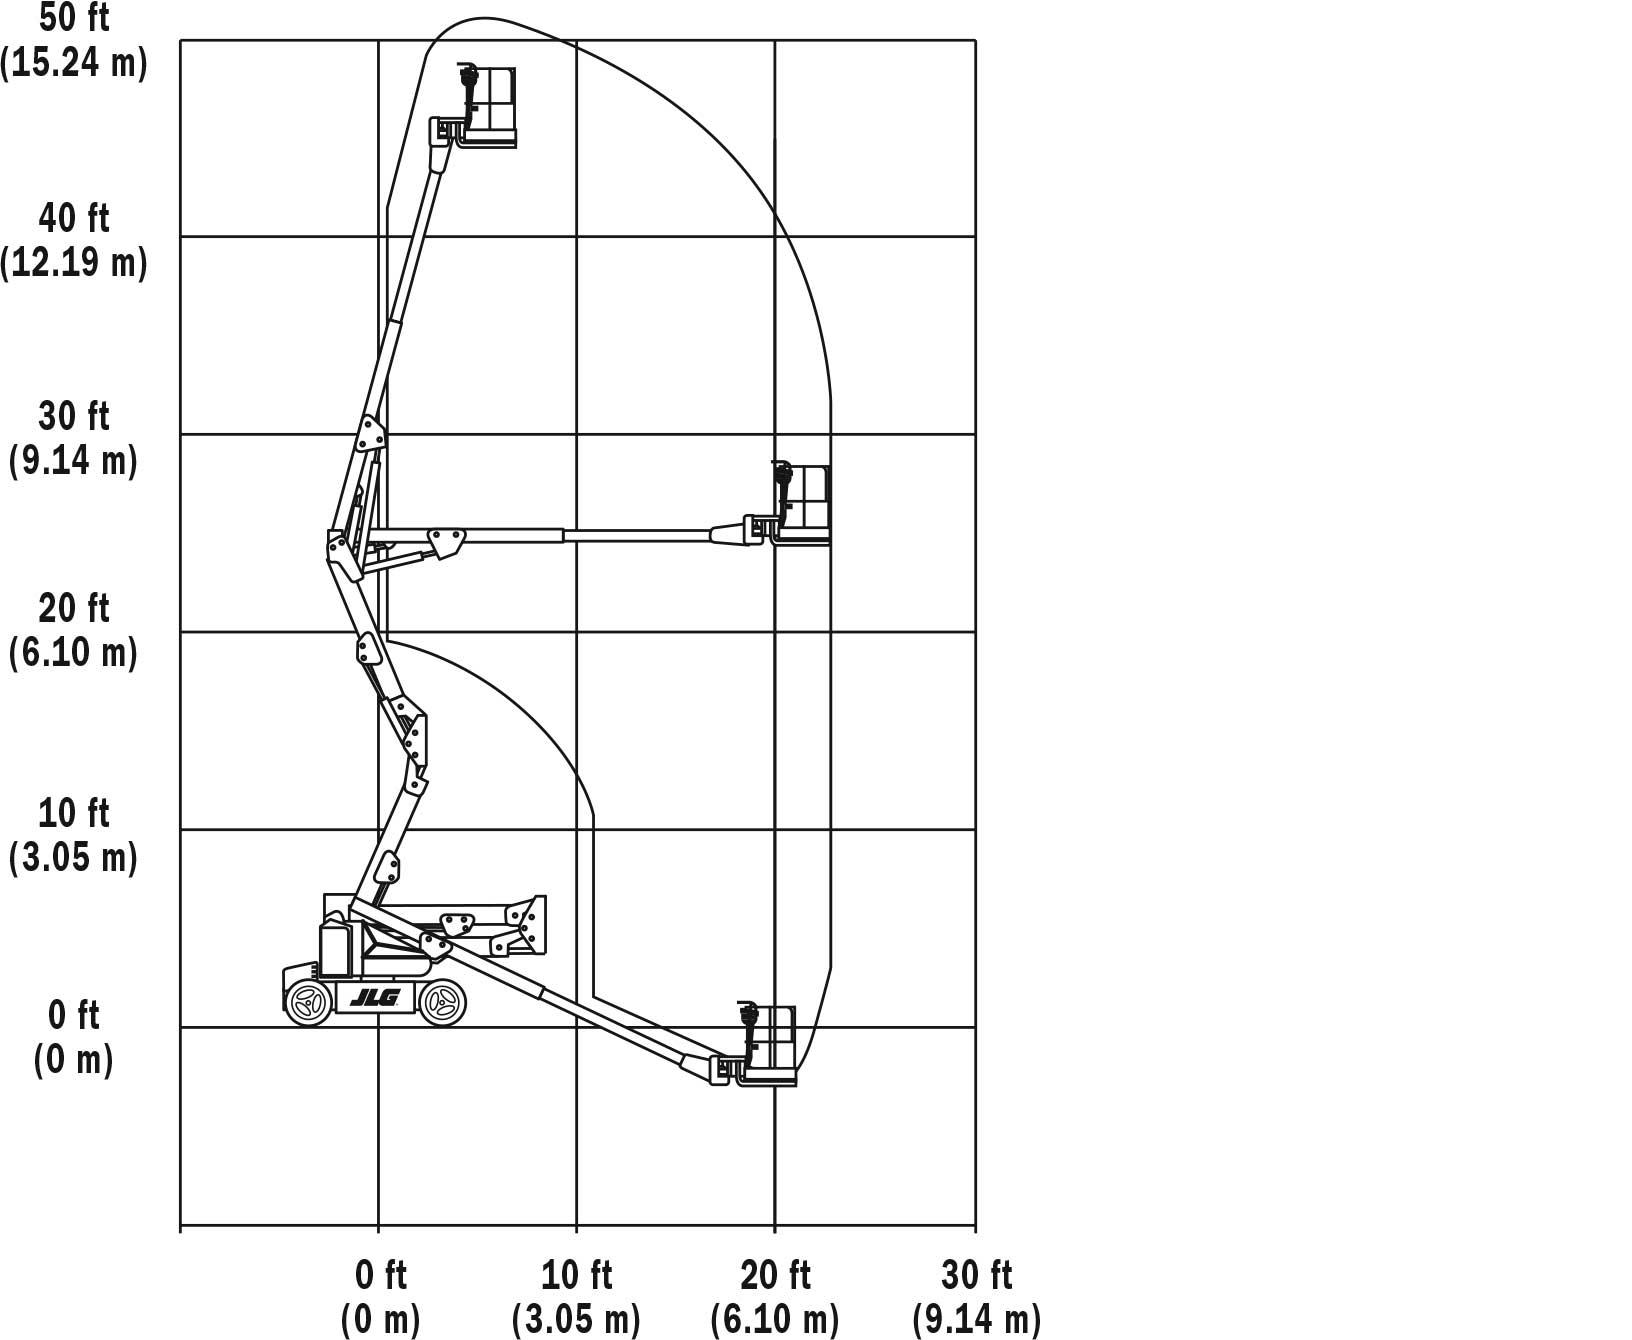 Jlg E 450 Wiring Schematics Anything Diagrams 1993 Dodge Van Diagram E450a Electric Boom Lift Rh Com Heater